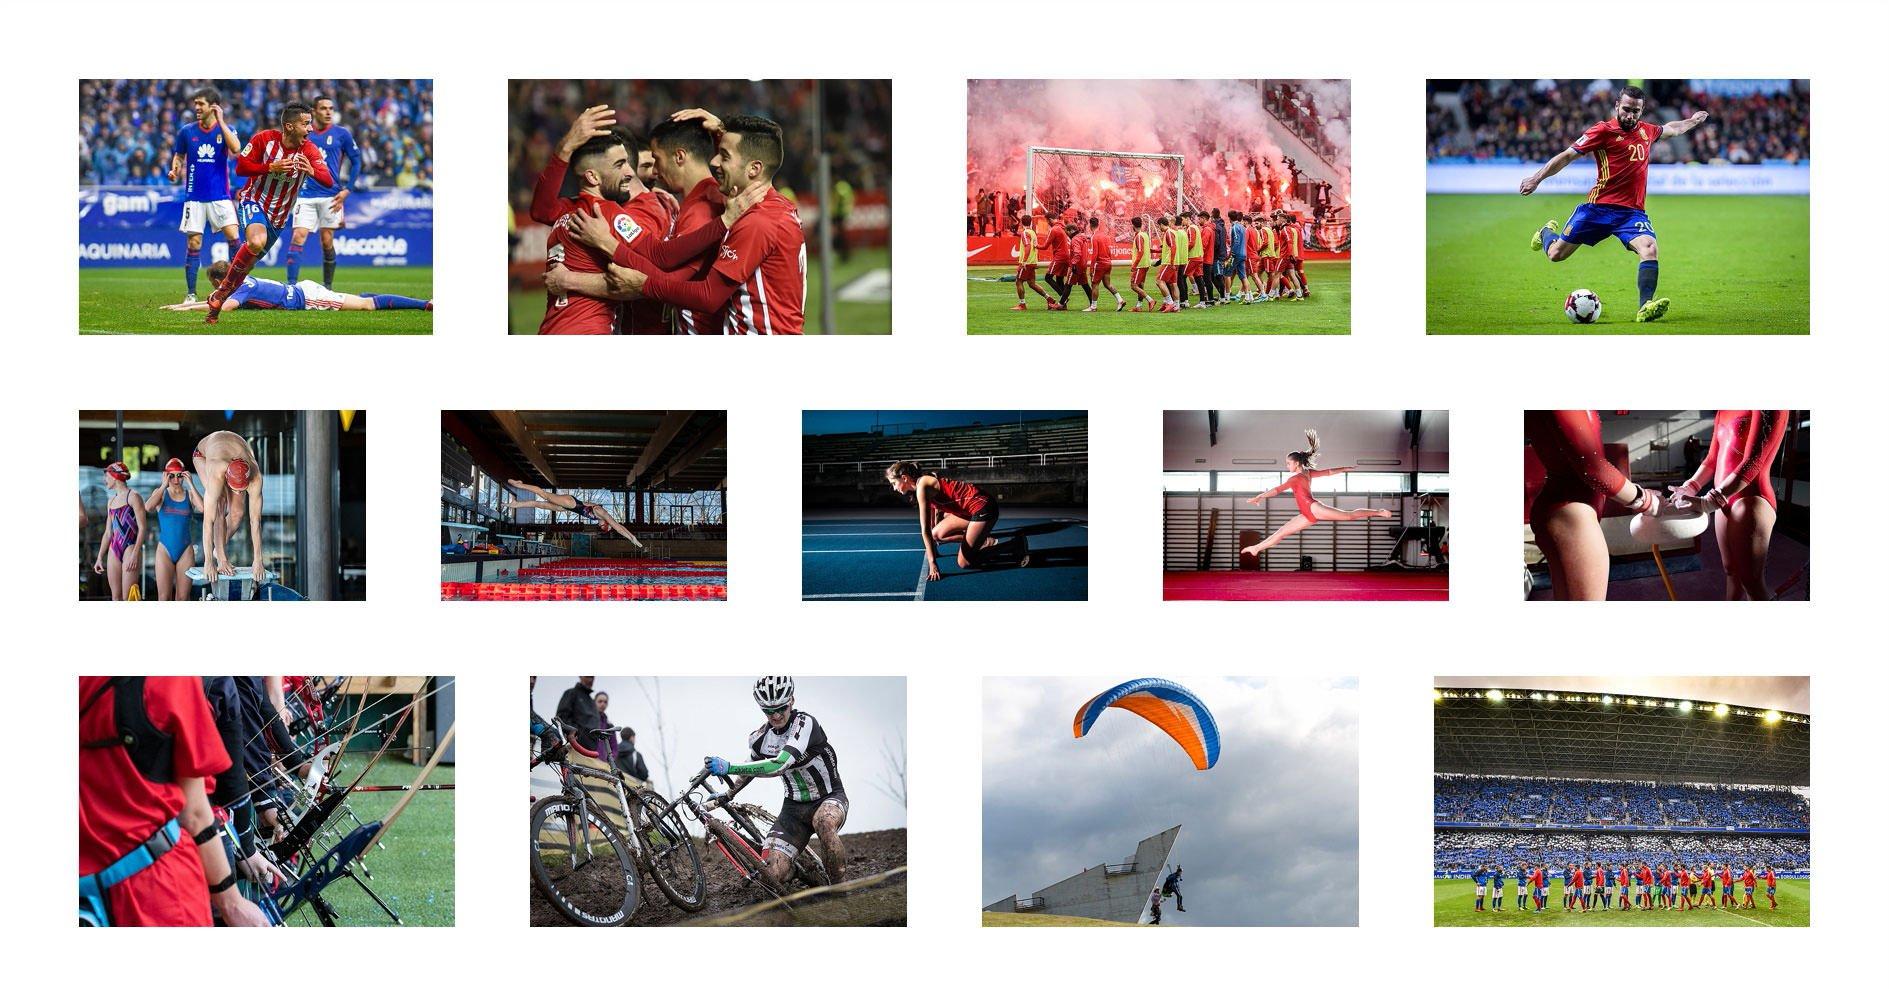 eventos-deportivos-en-Asturias